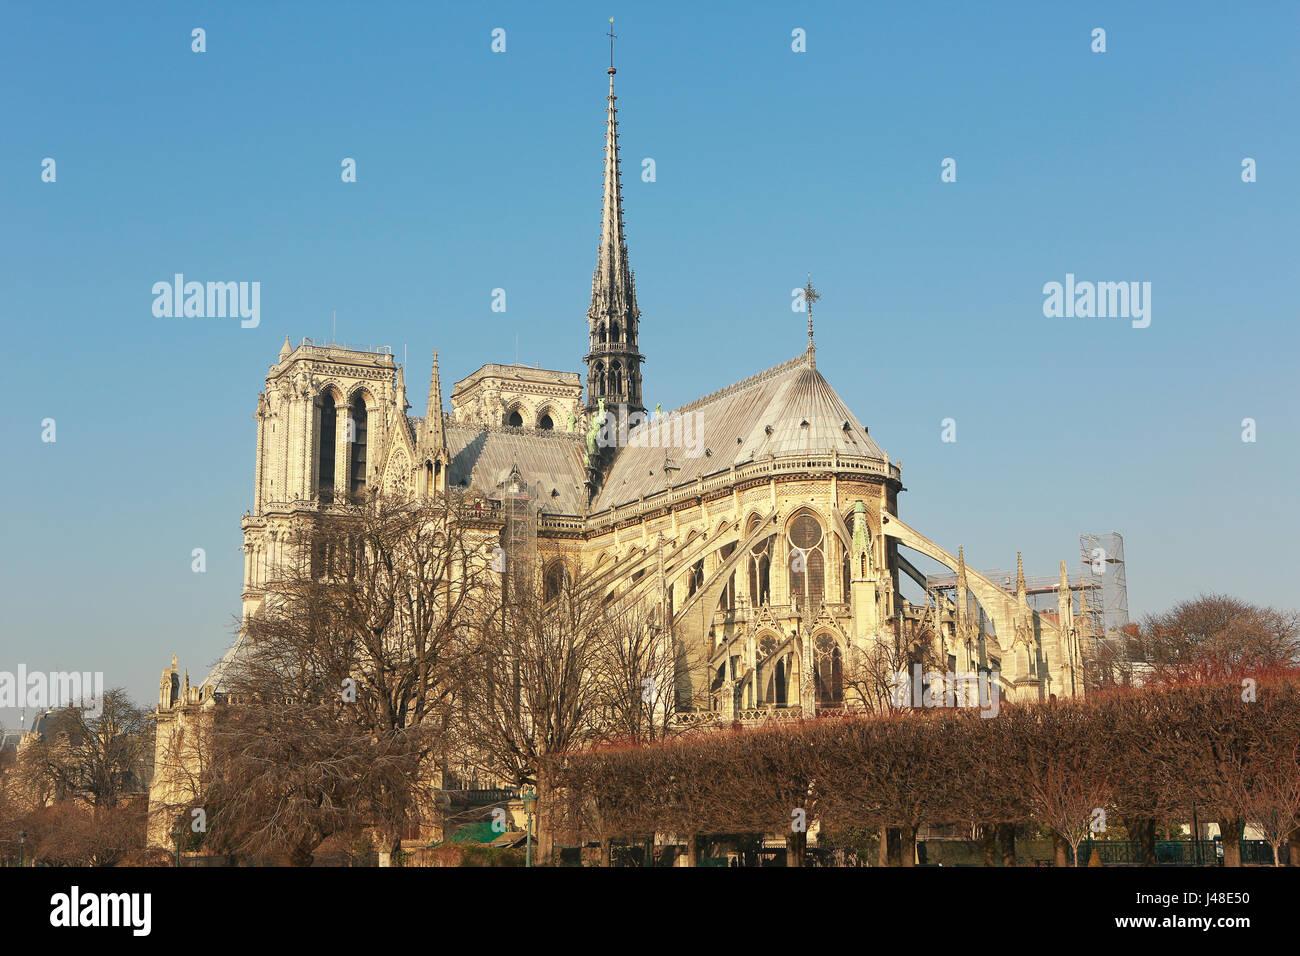 Seine River and historical landmarks around - Stock Image